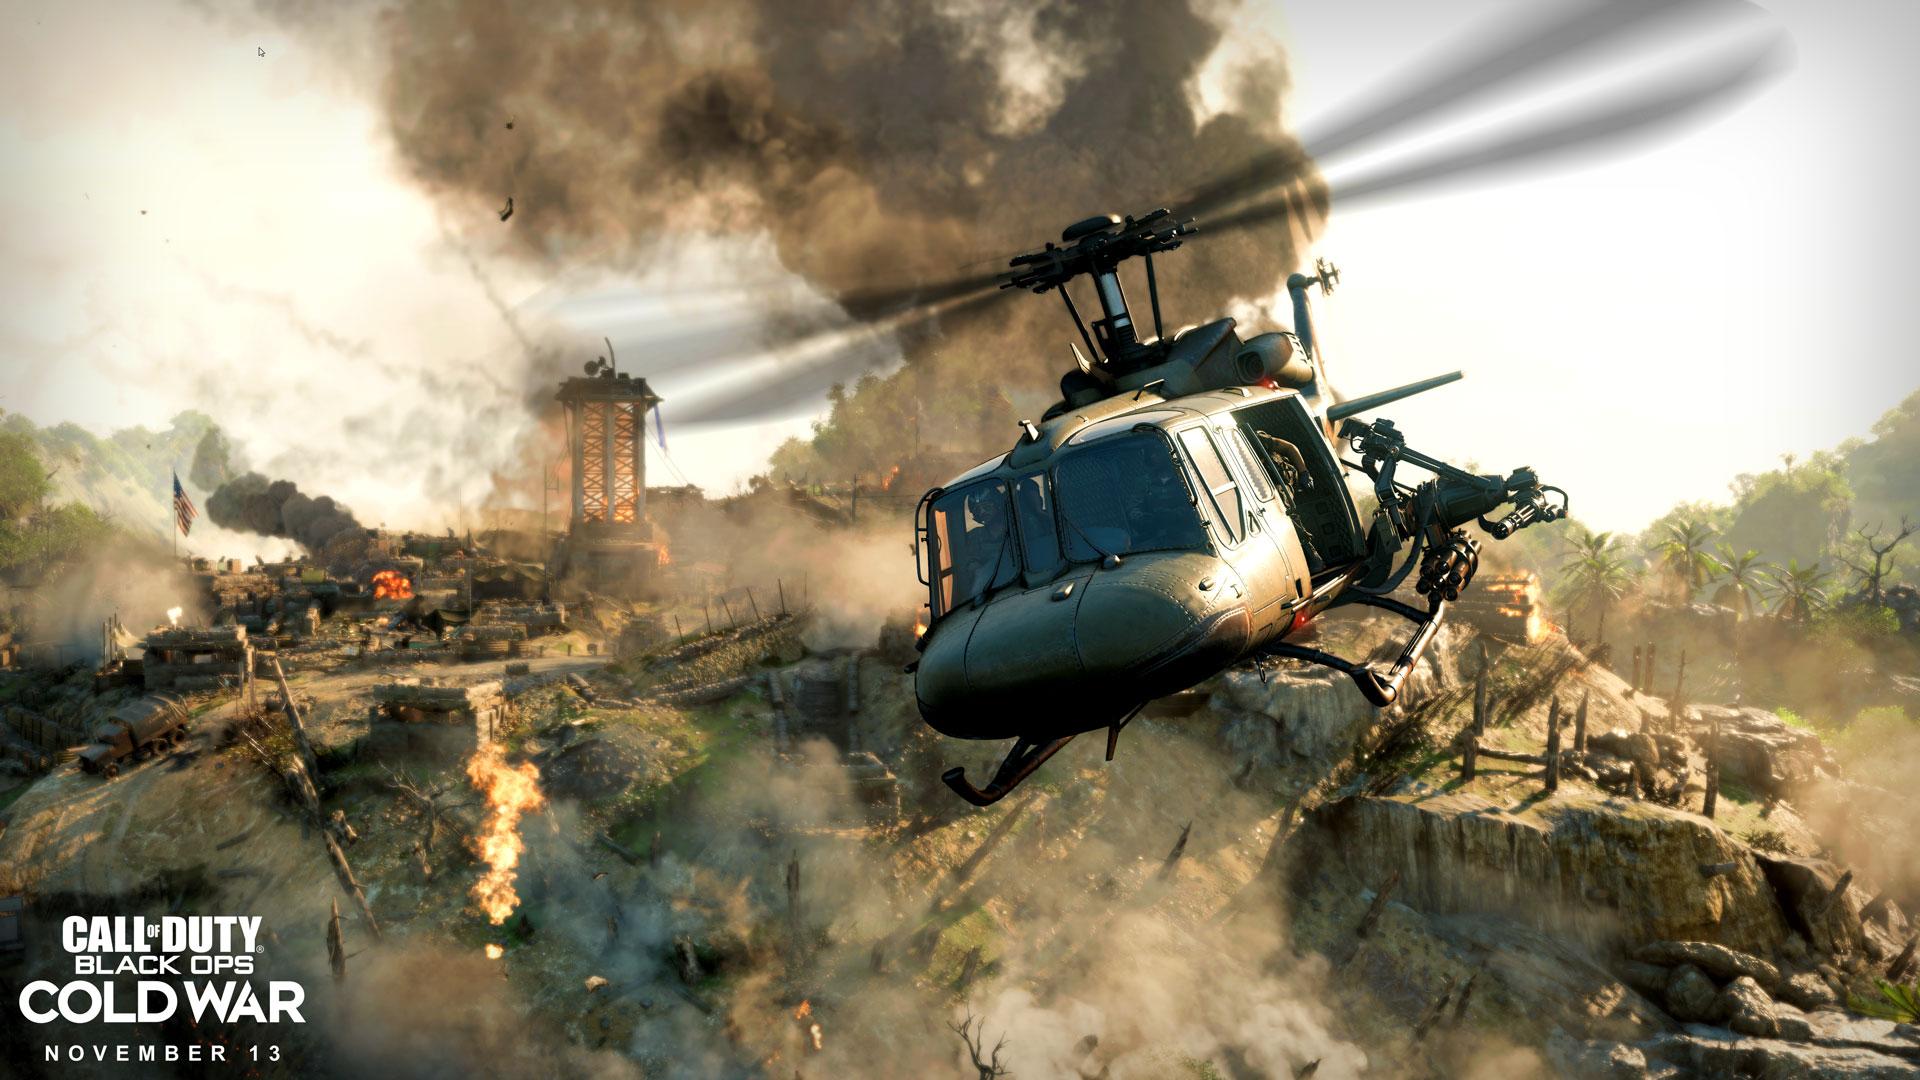 Black Ops Cold War helicopter